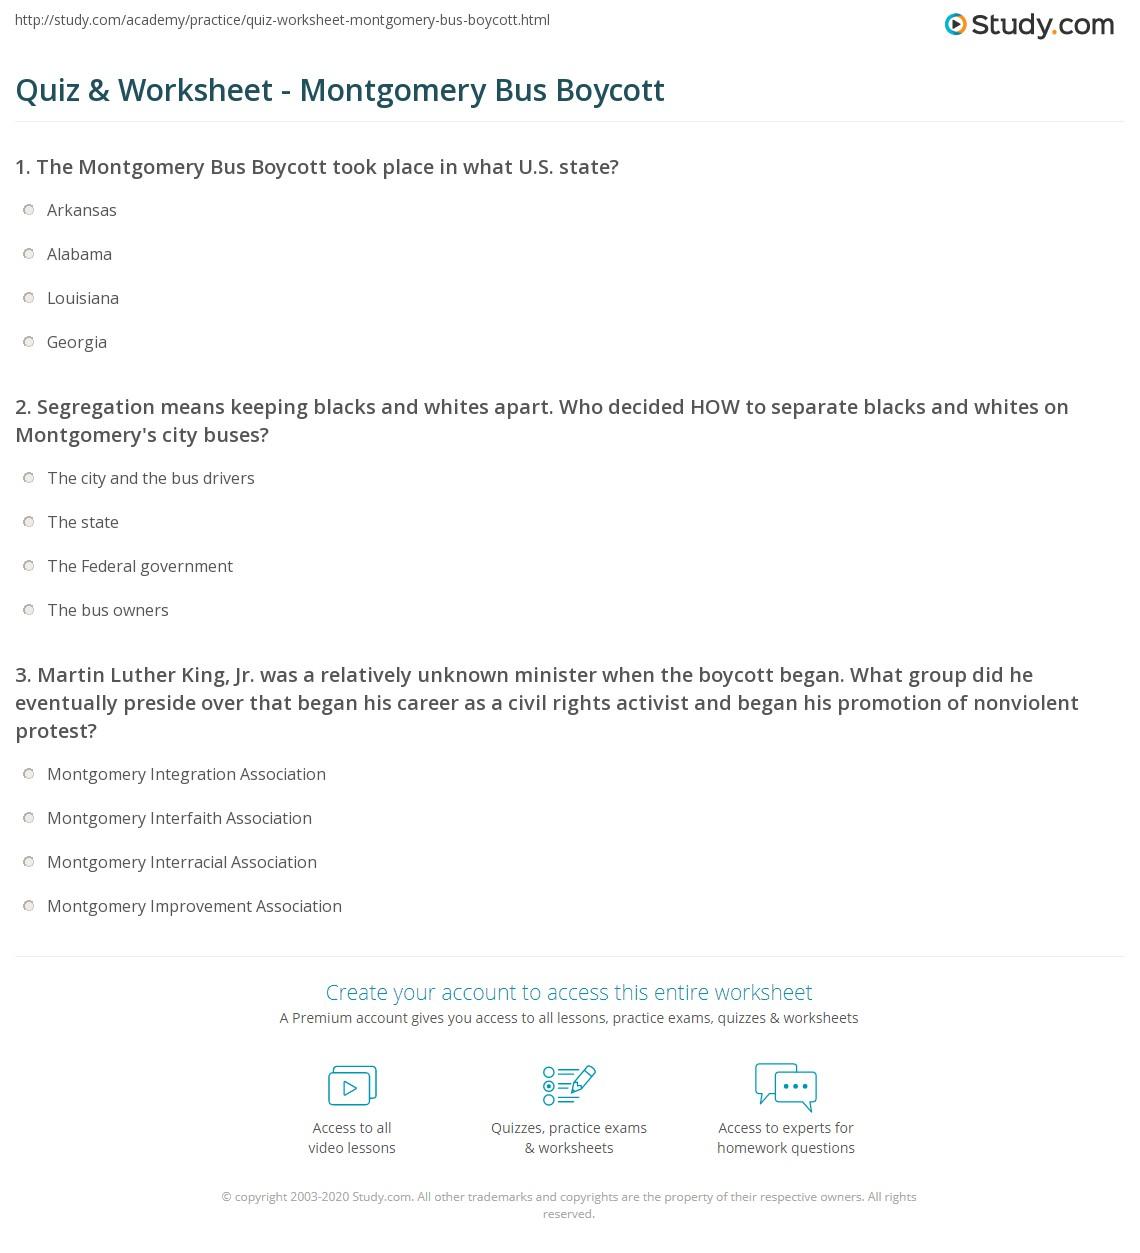 ... Bus Boycott: Definition, Summary, Facts & Timeline Worksheet